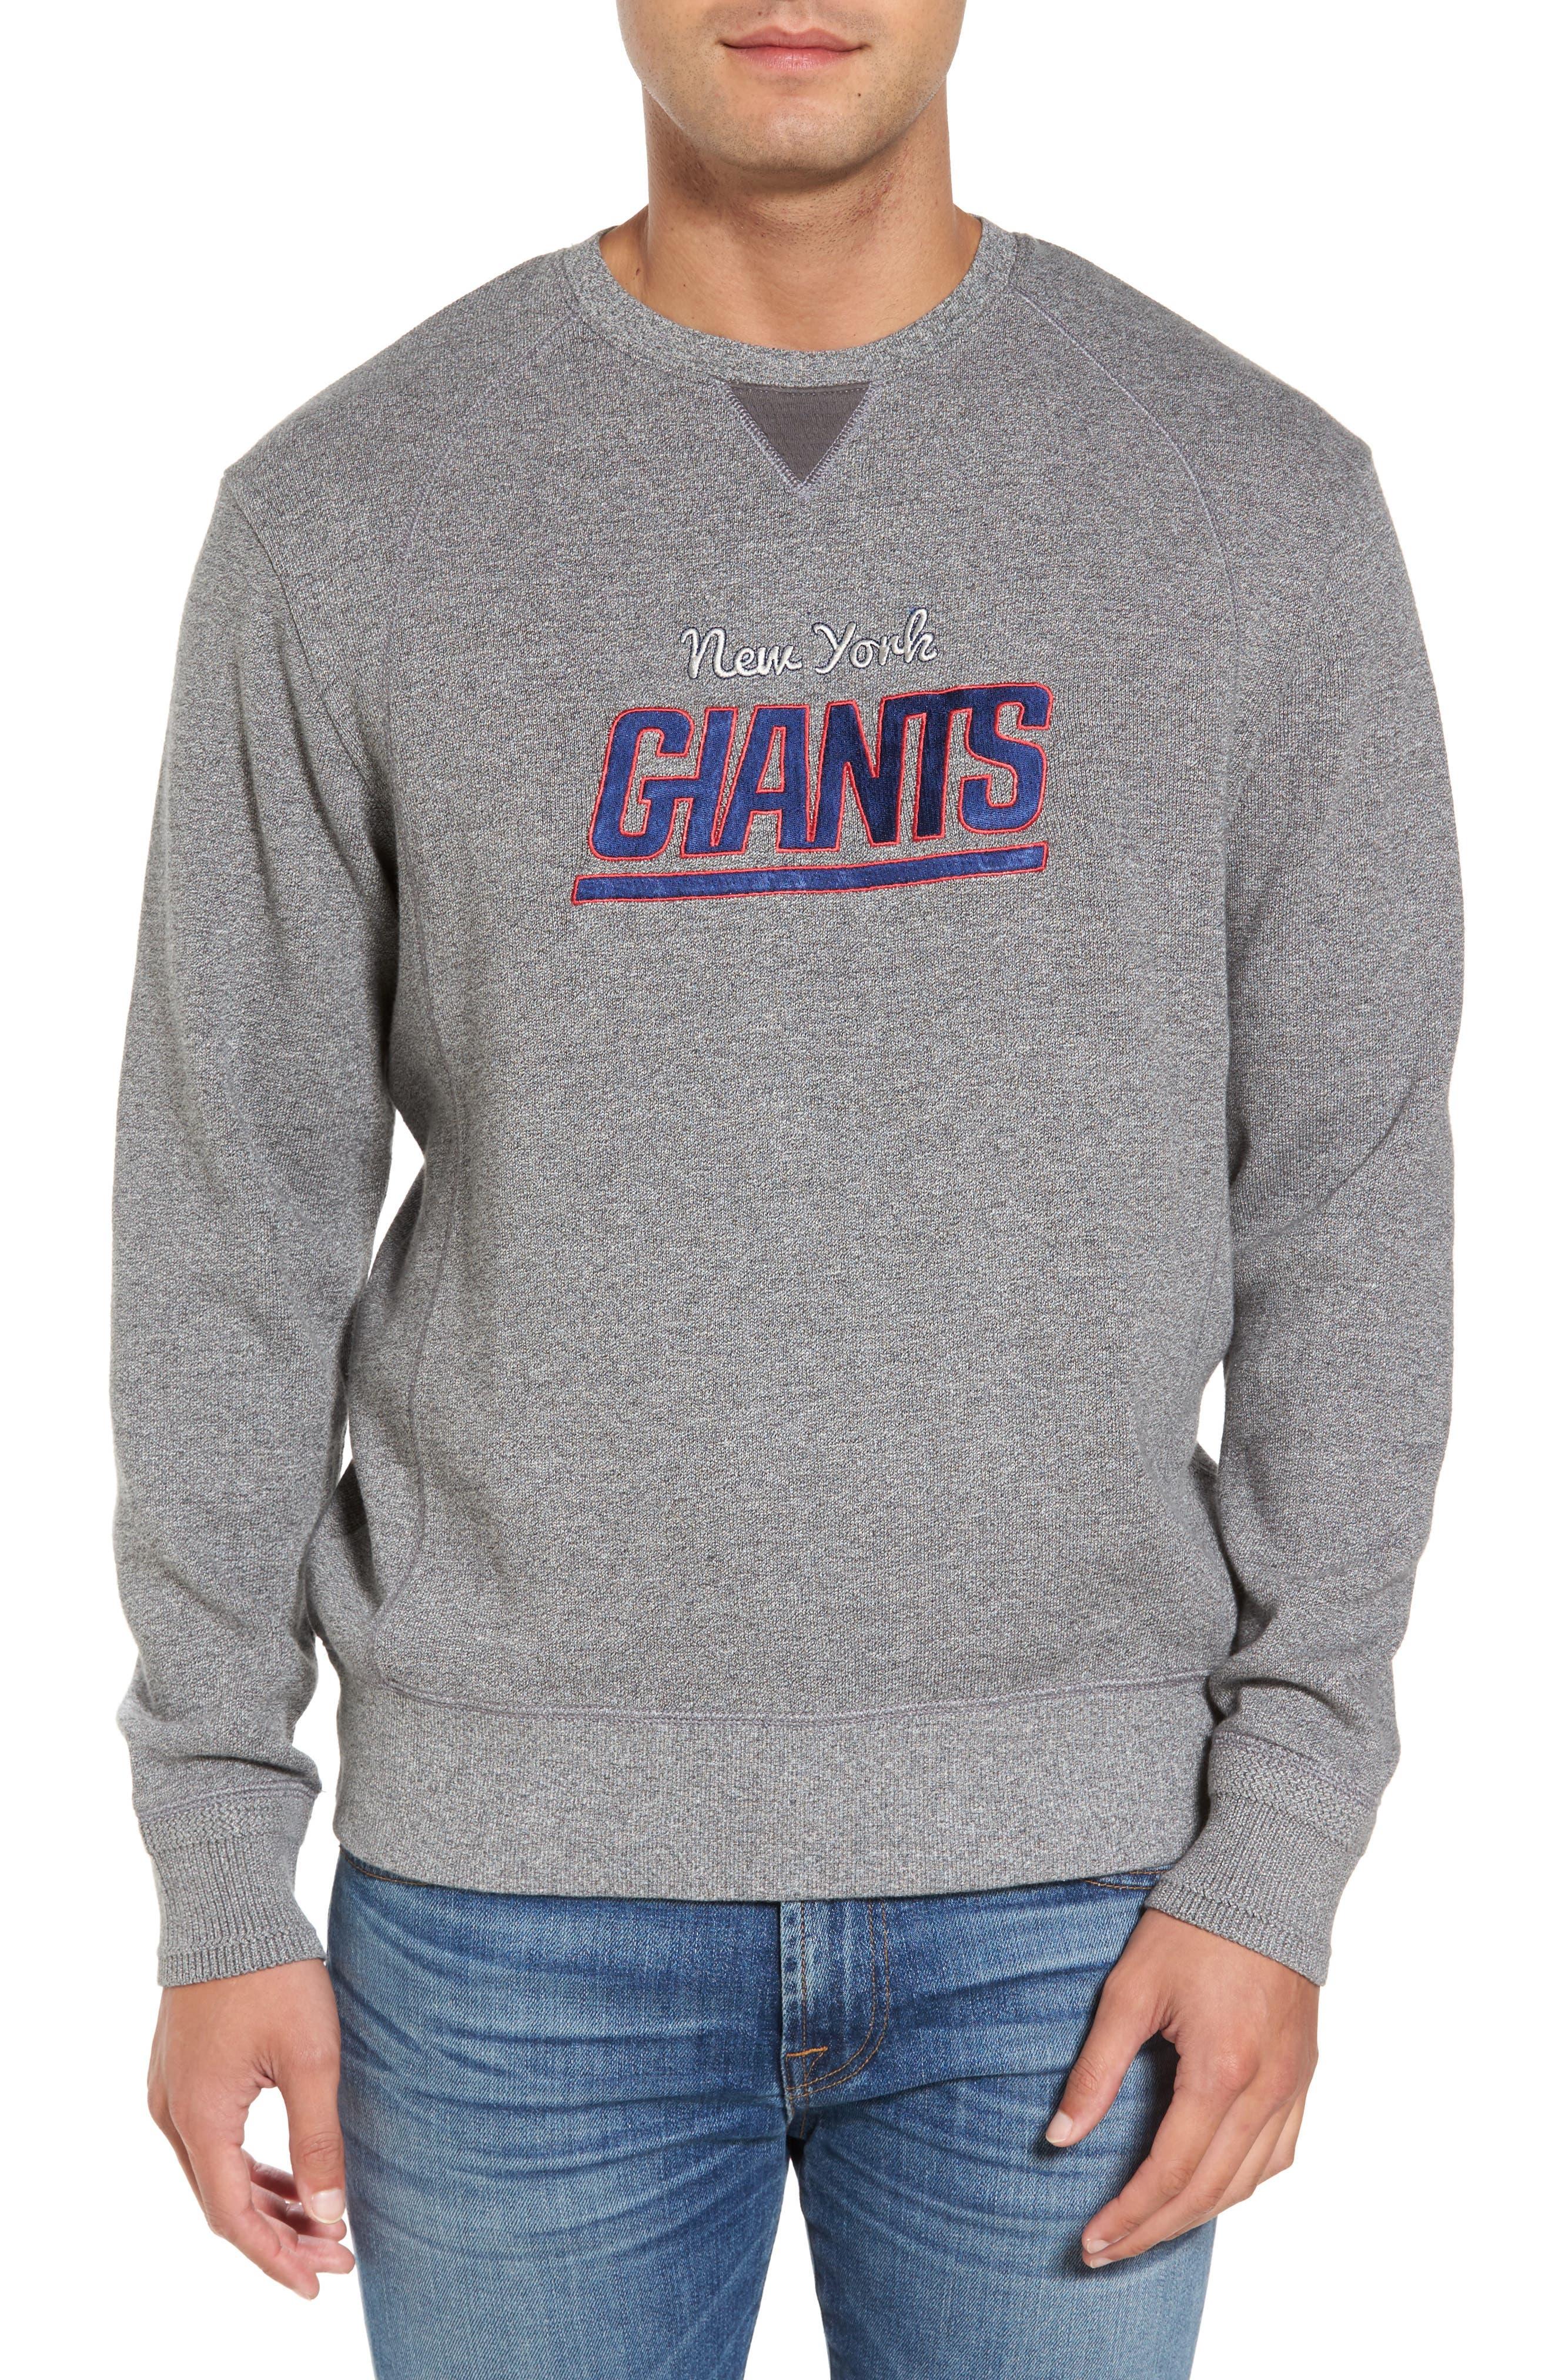 NFL Stitch of Liberty Embroidered Crewneck Sweatshirt,                             Main thumbnail 19, color,